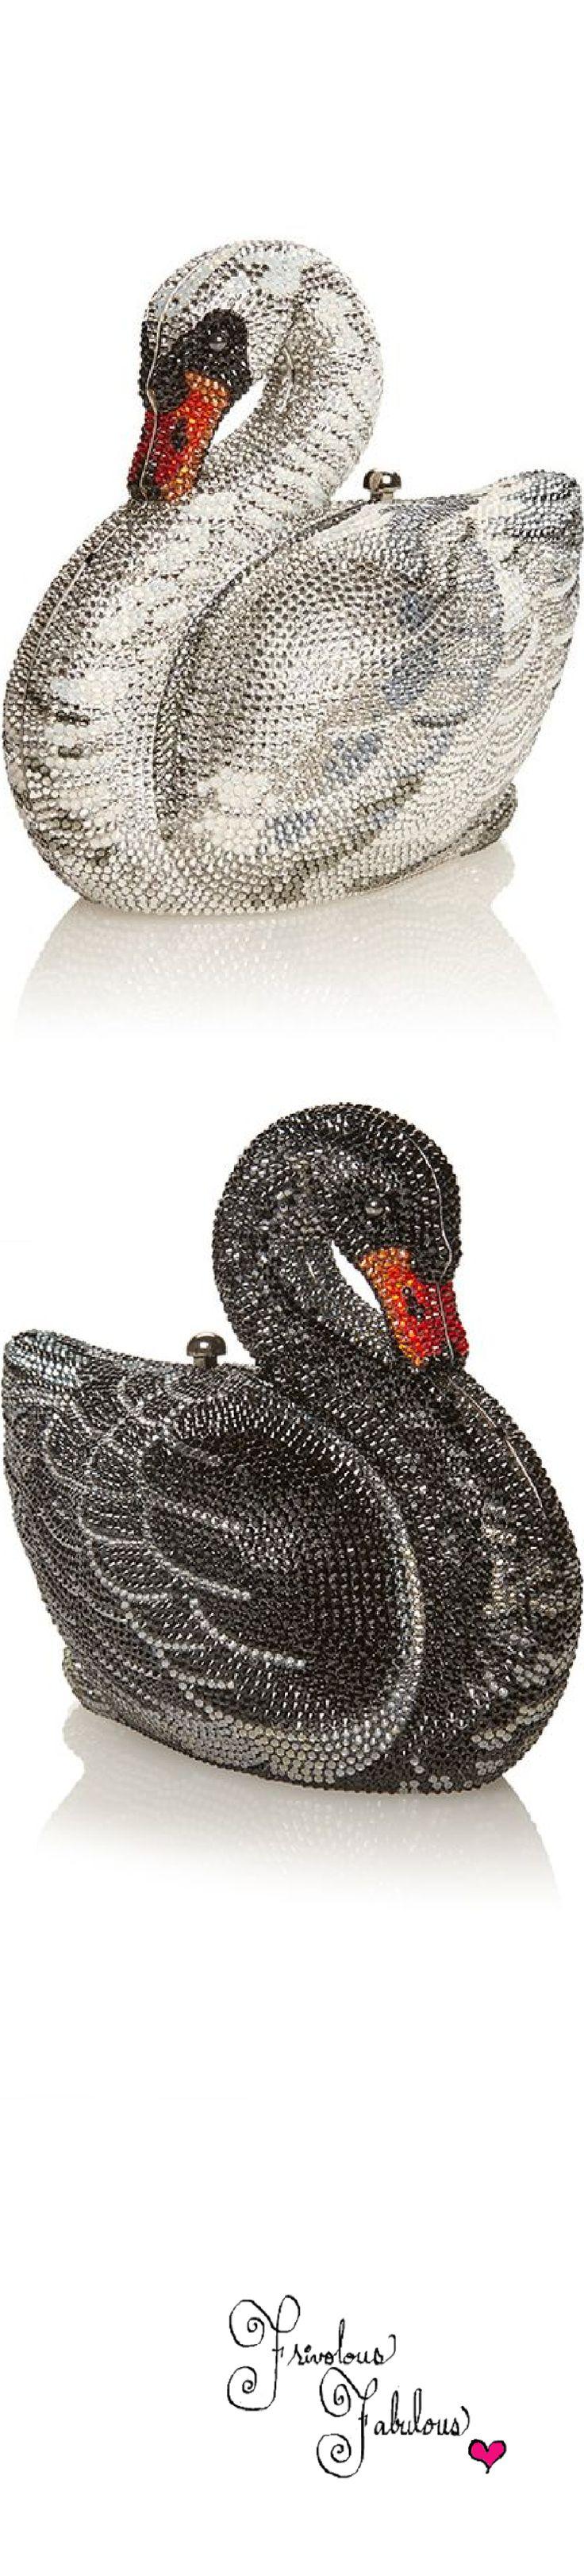 Judith Leiber swan handbags